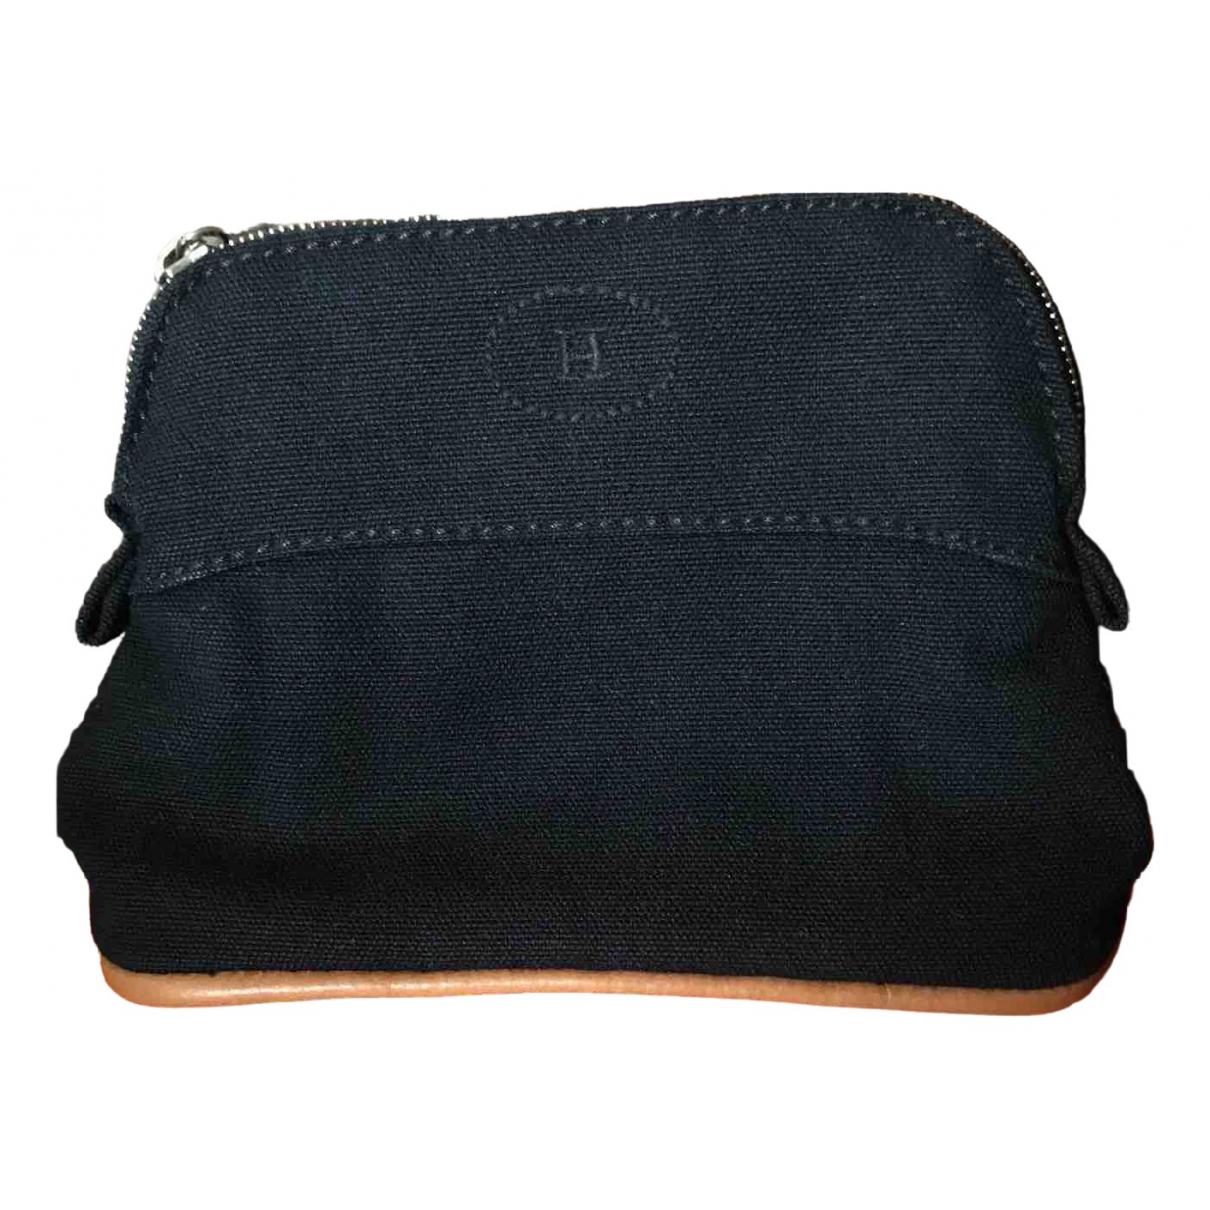 Hermès Bolide Navy Cloth Travel bag for Women \N